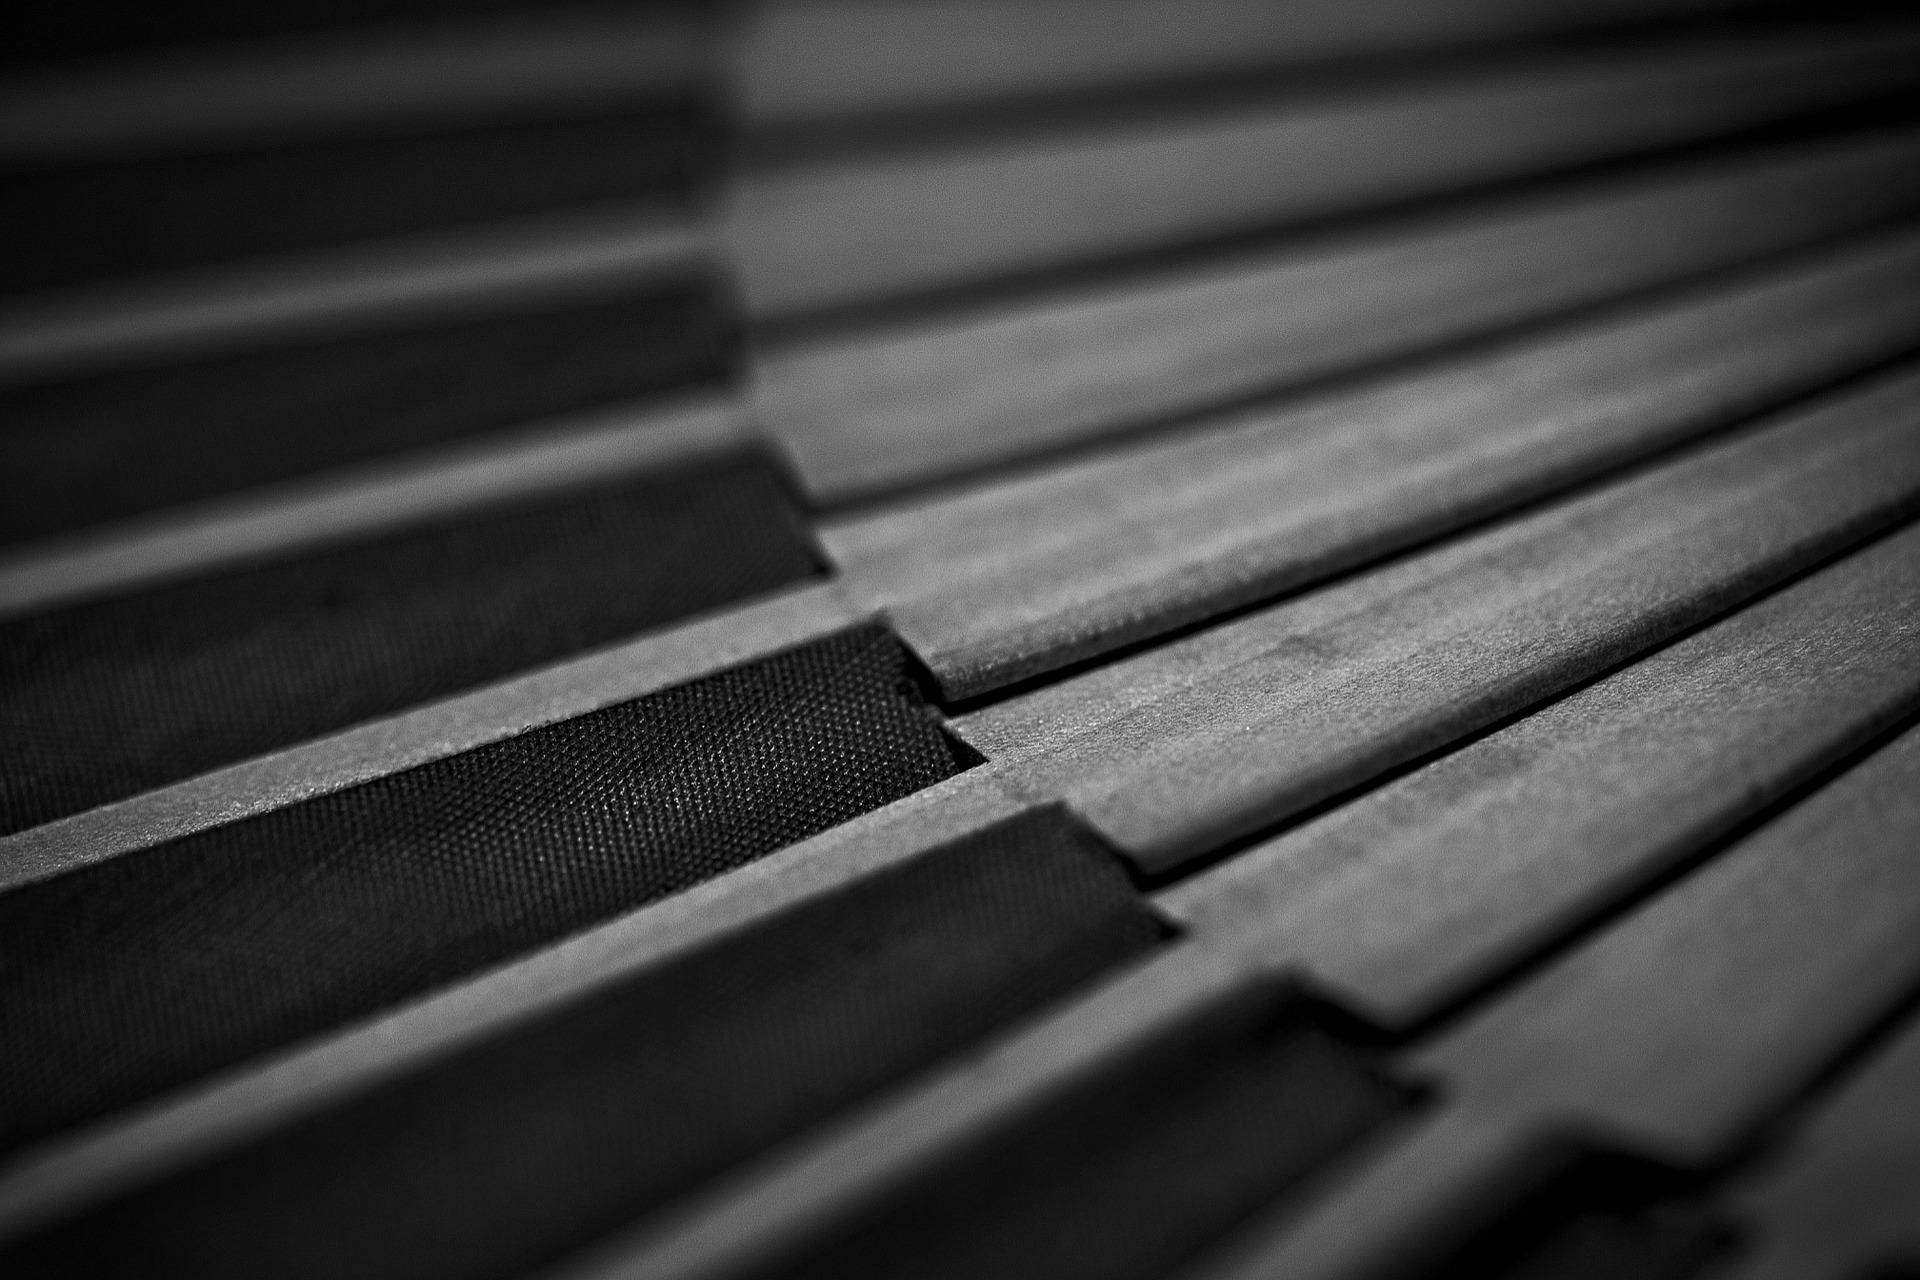 abanico de madera e blanco y negro